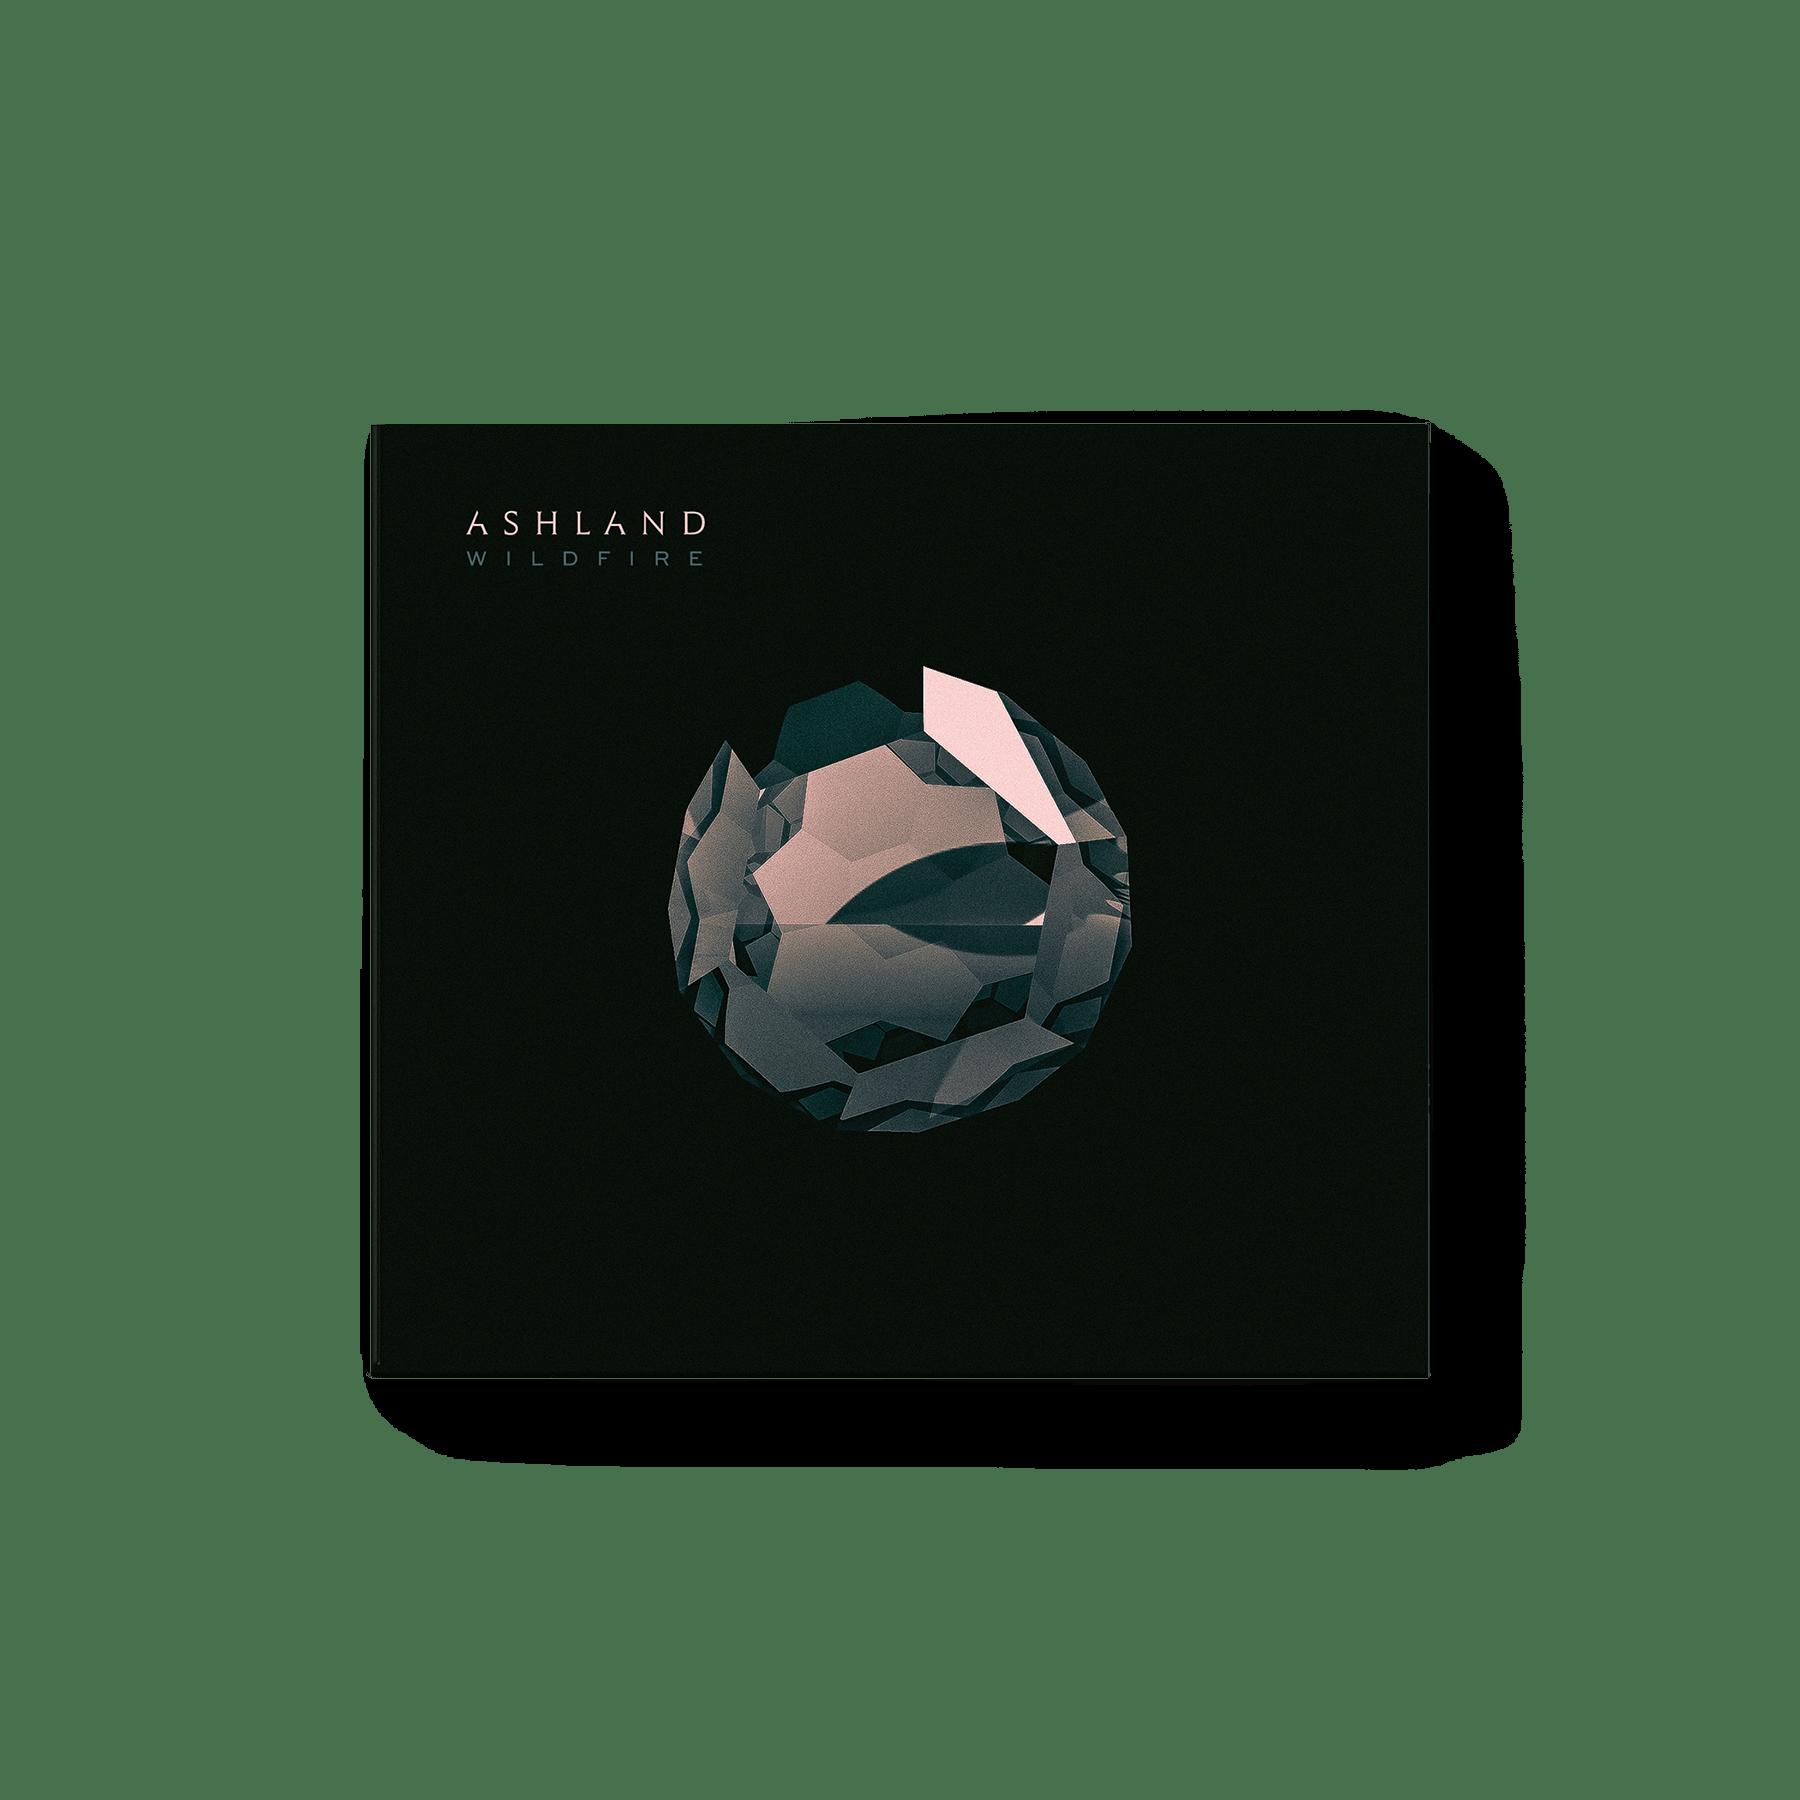 ASHLAND-01-TRANS.png